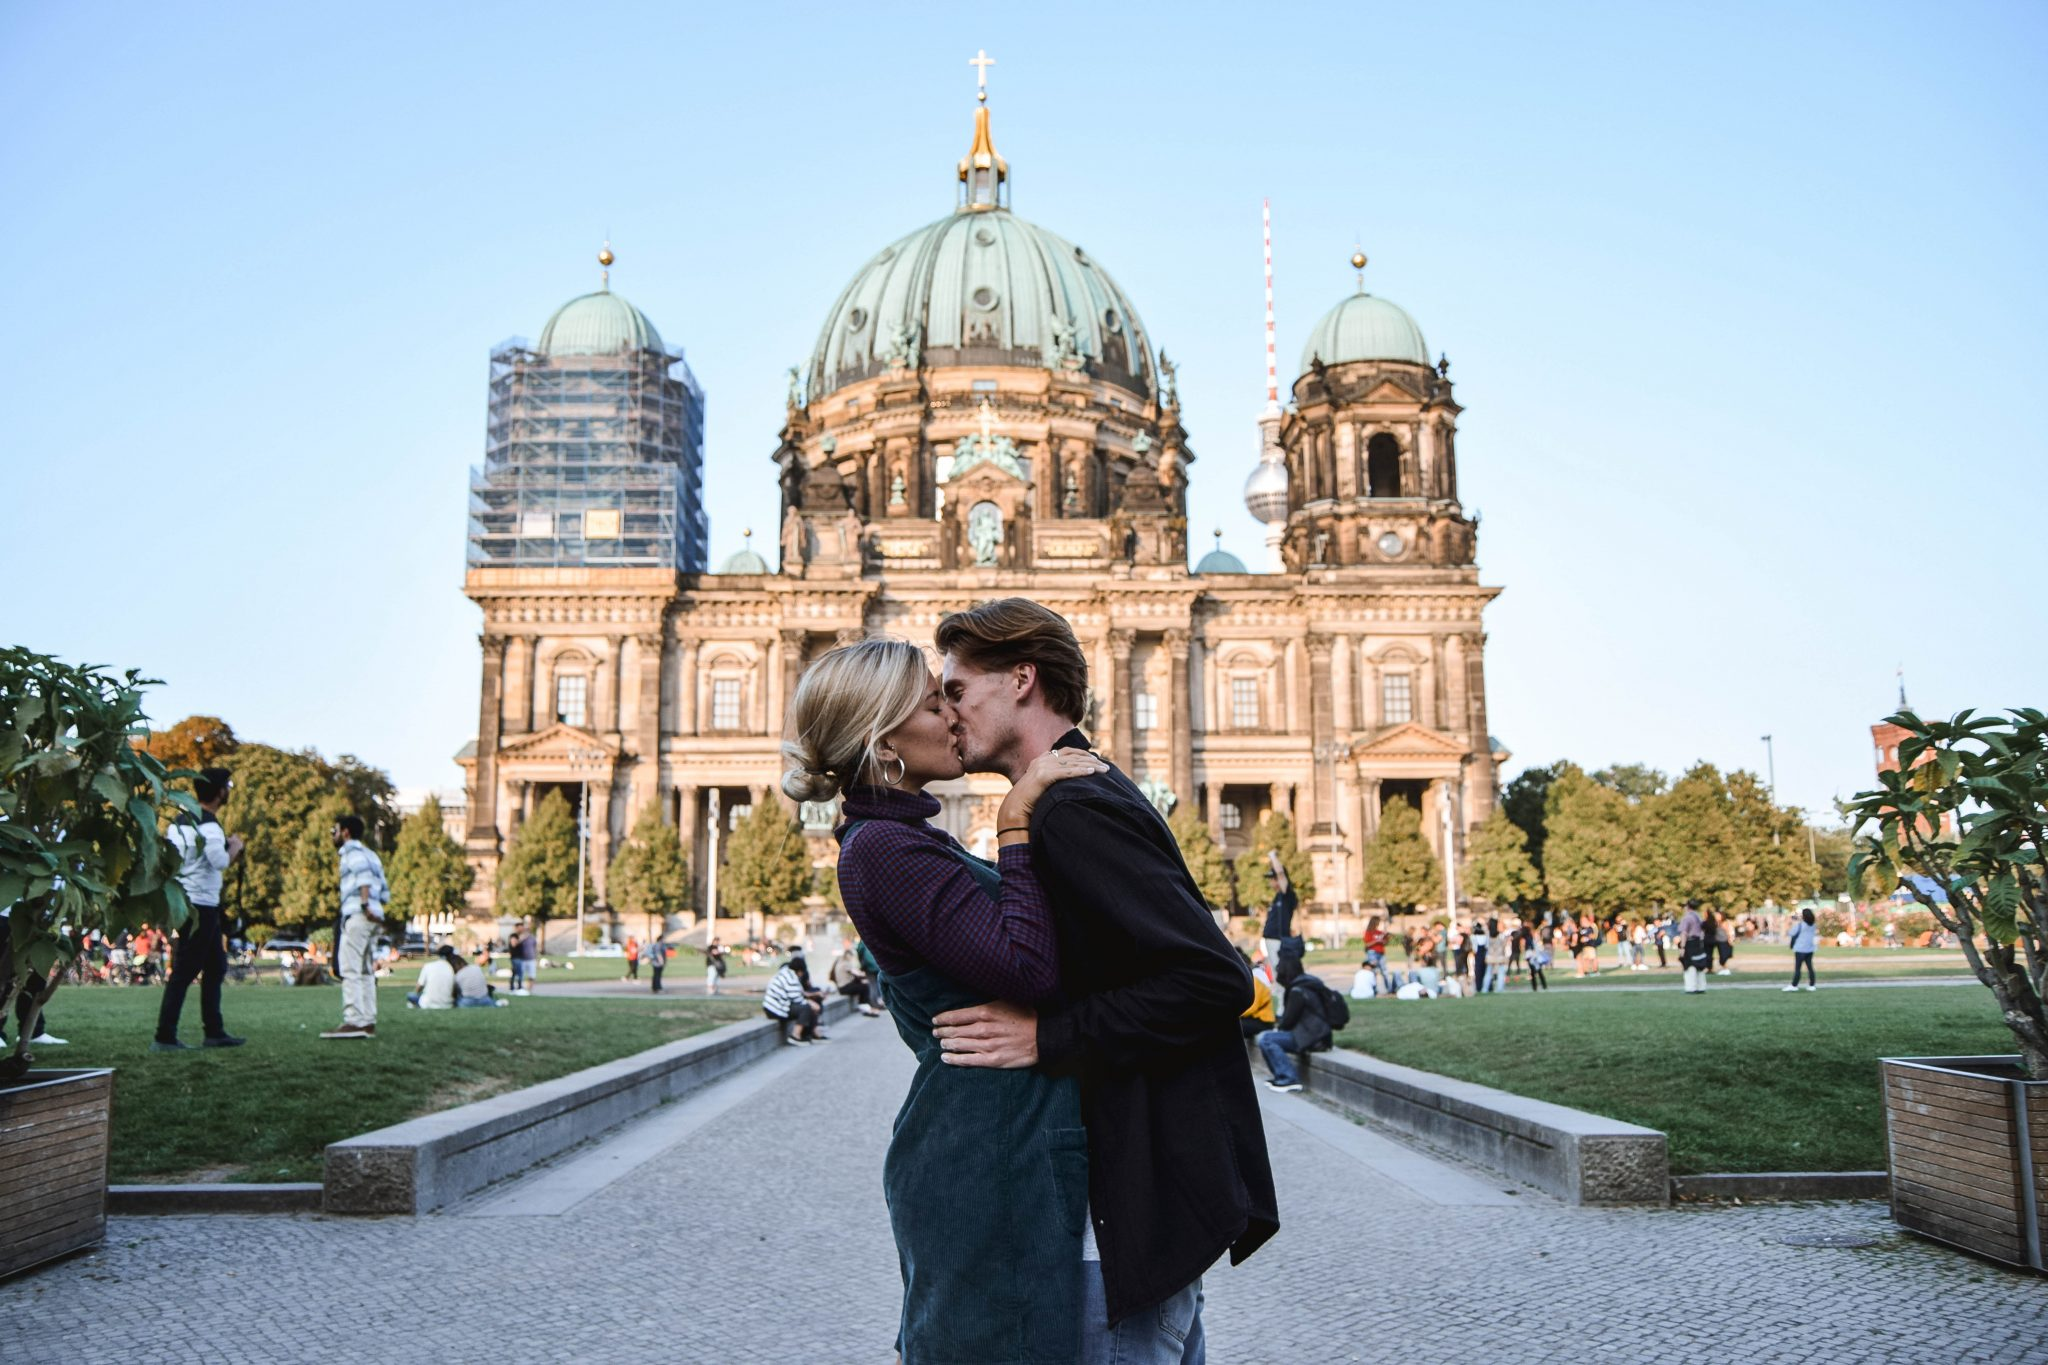 Wanderers & Warriors - Charlie & Lauren UK Travel Couple - Top Things To Do In Berlin Cathedral Berlin